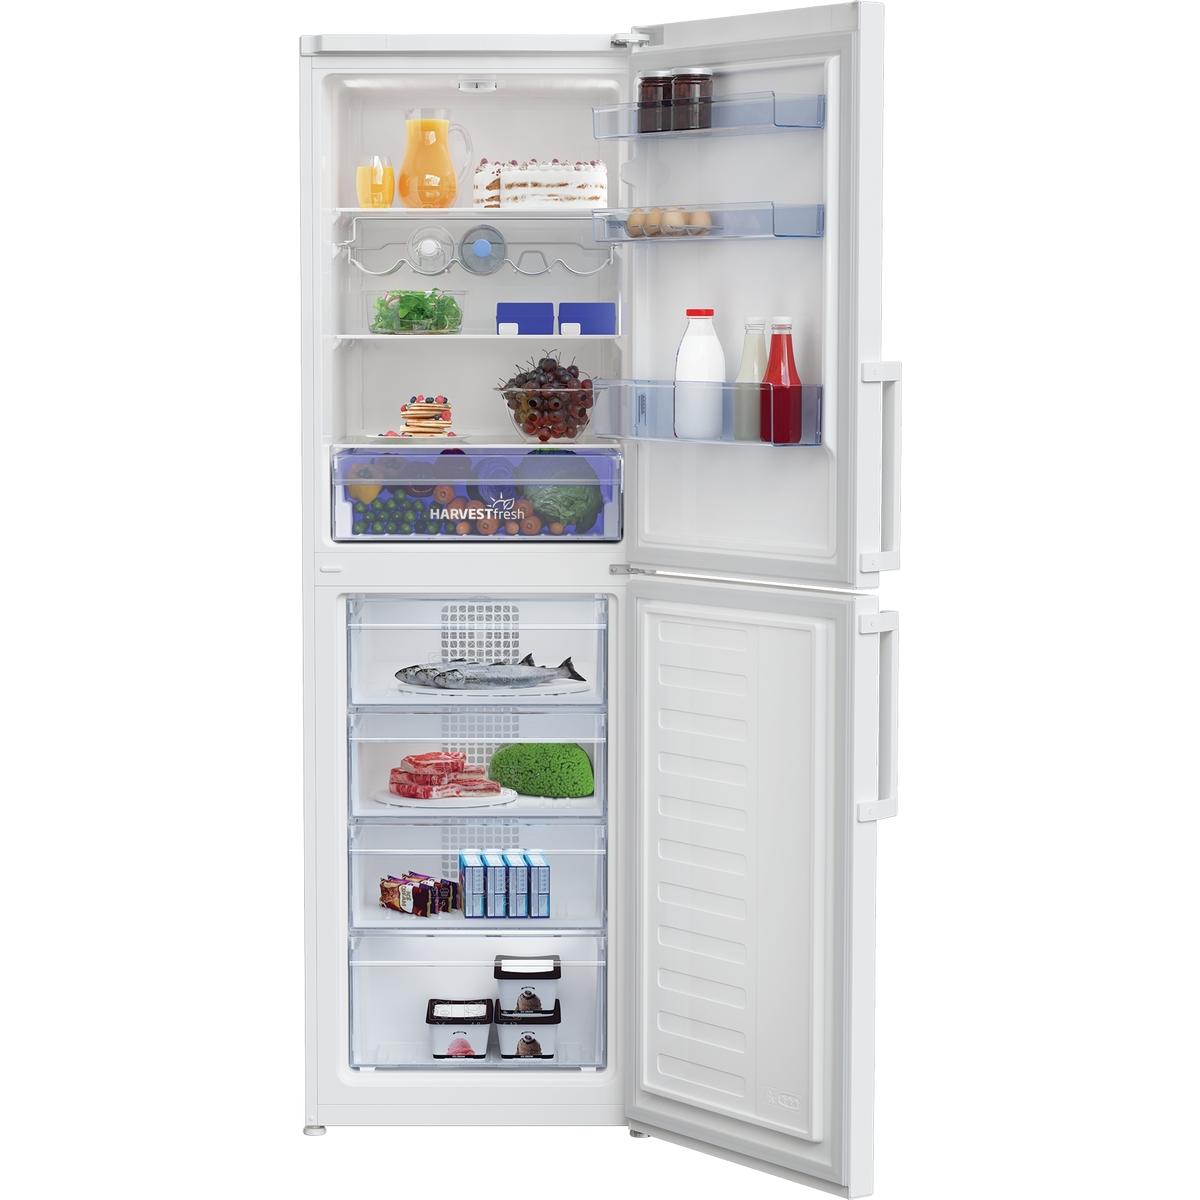 Beko CFP3691VW 60cm Freestanding Frost Free Combi Fridge Freezer